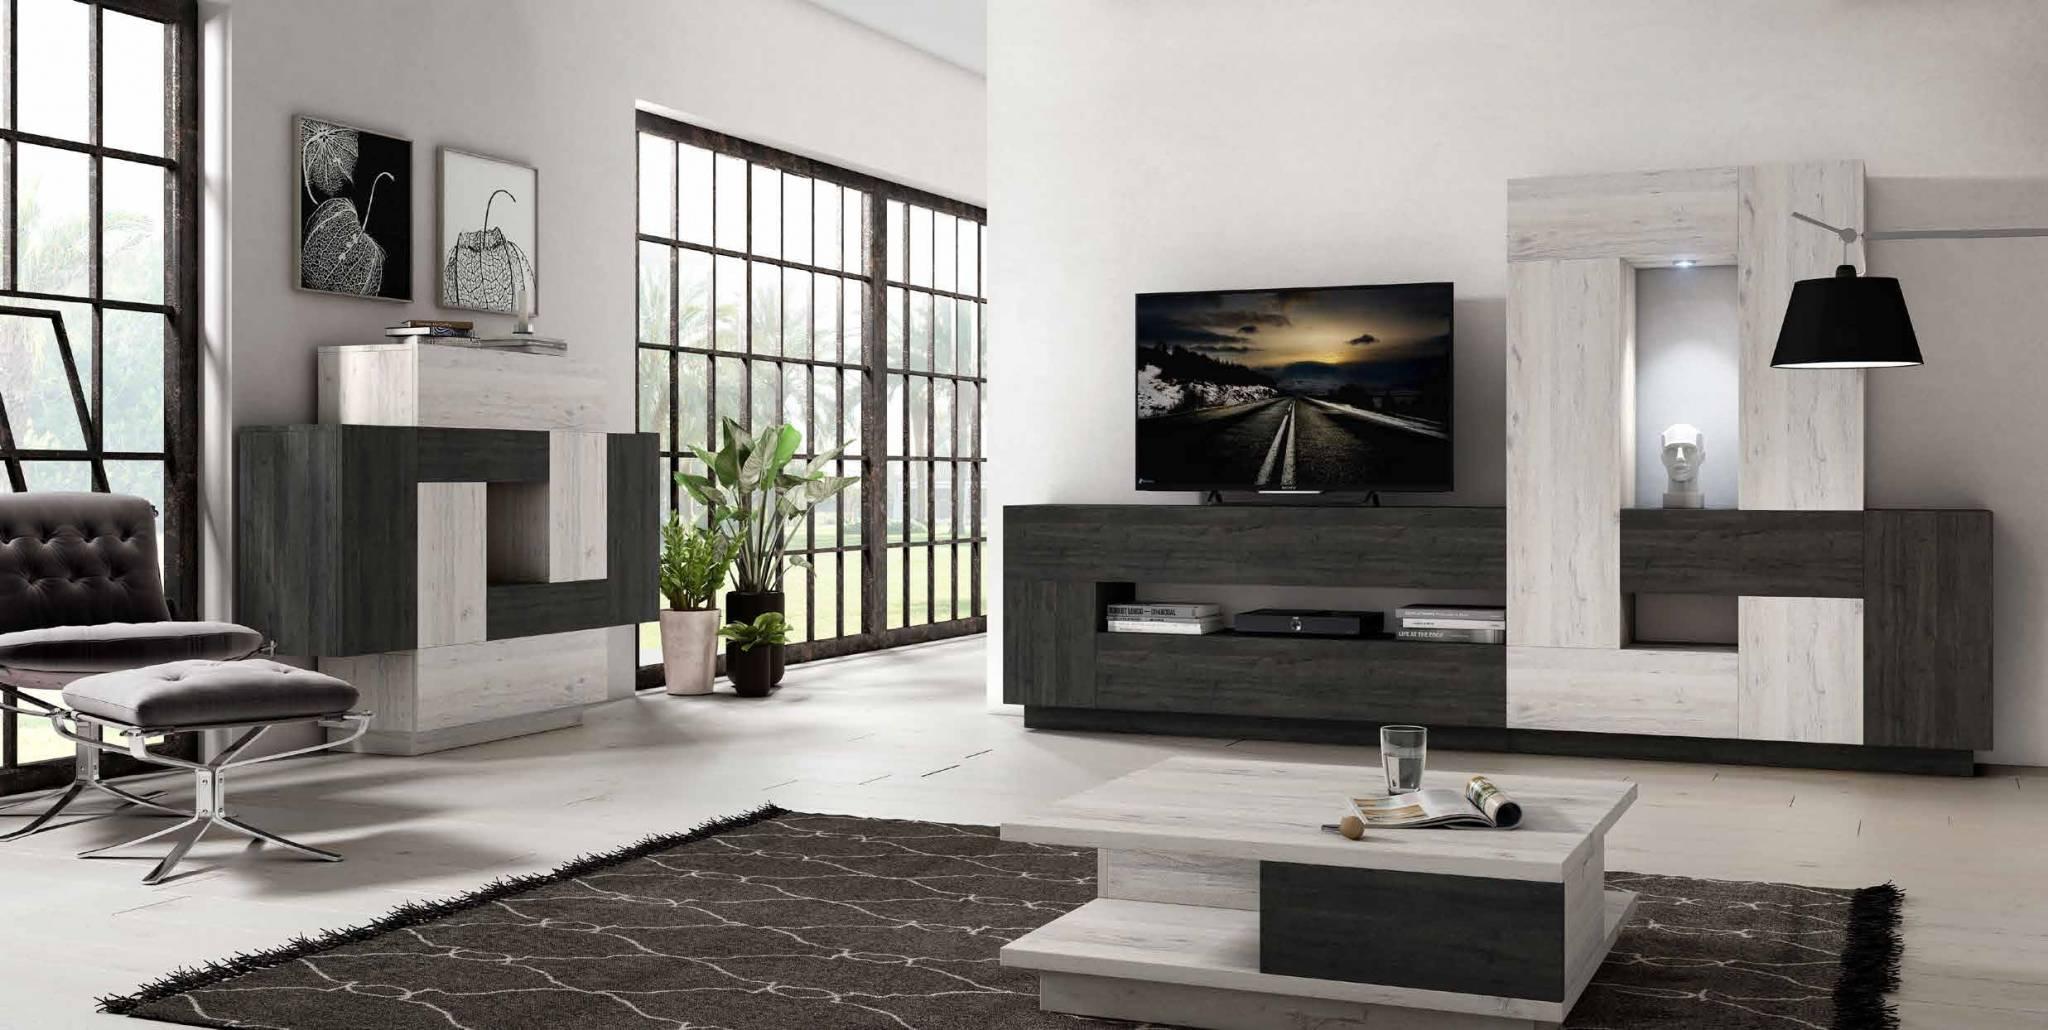 Sal n moderno tetris b muebles d azmuebles d az - Muebles para el salon modernos ...